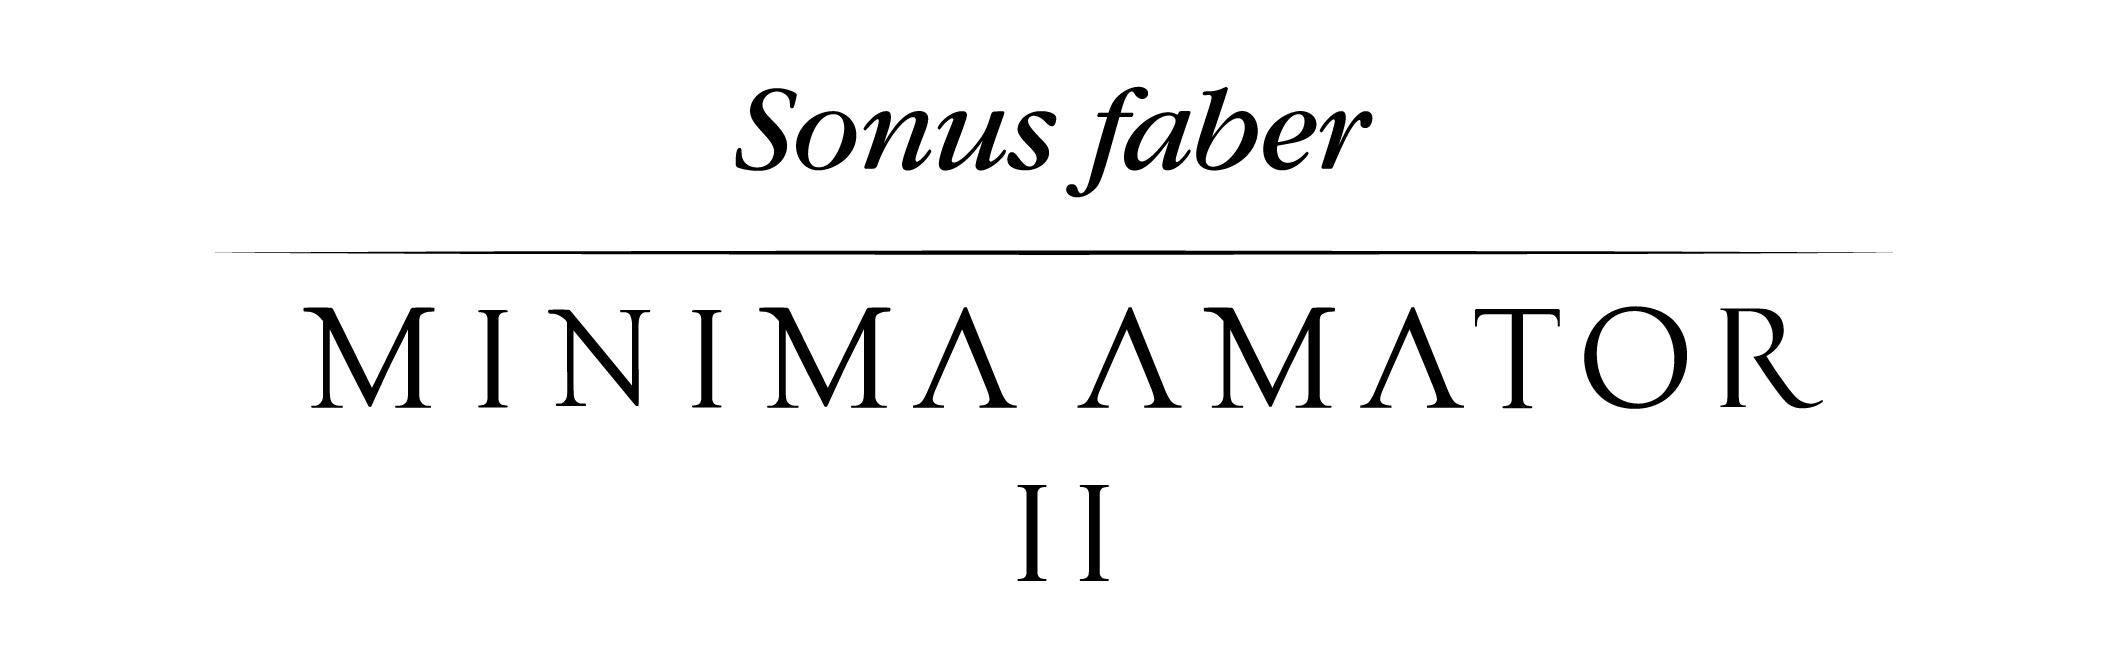 minima logo-01.jpg